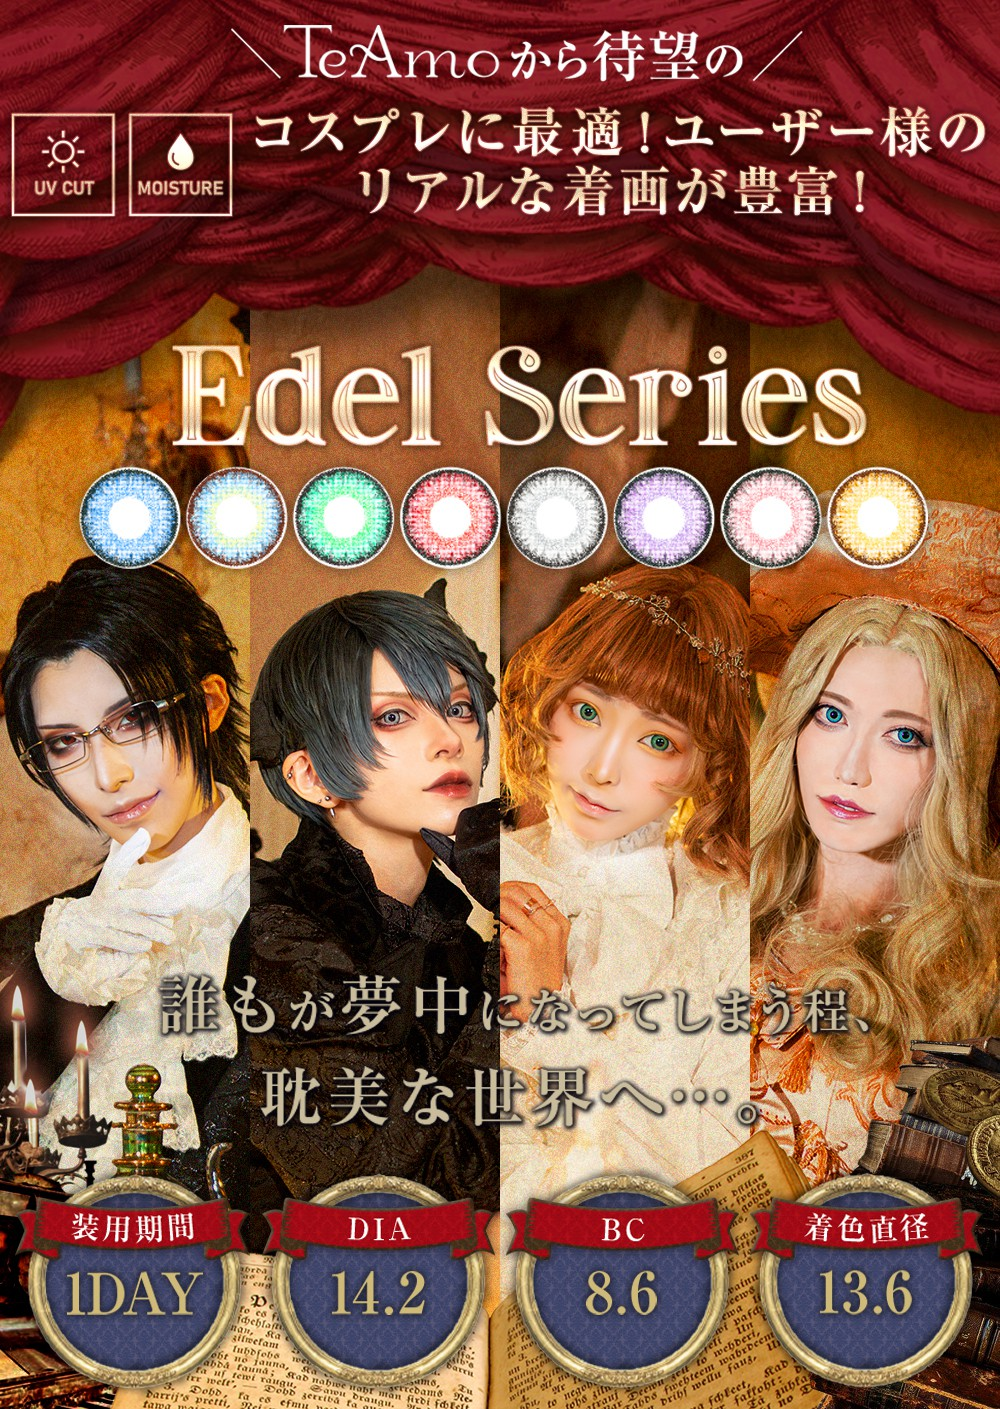 「Edel Series(エーデルシリーズ)」トップイメージ